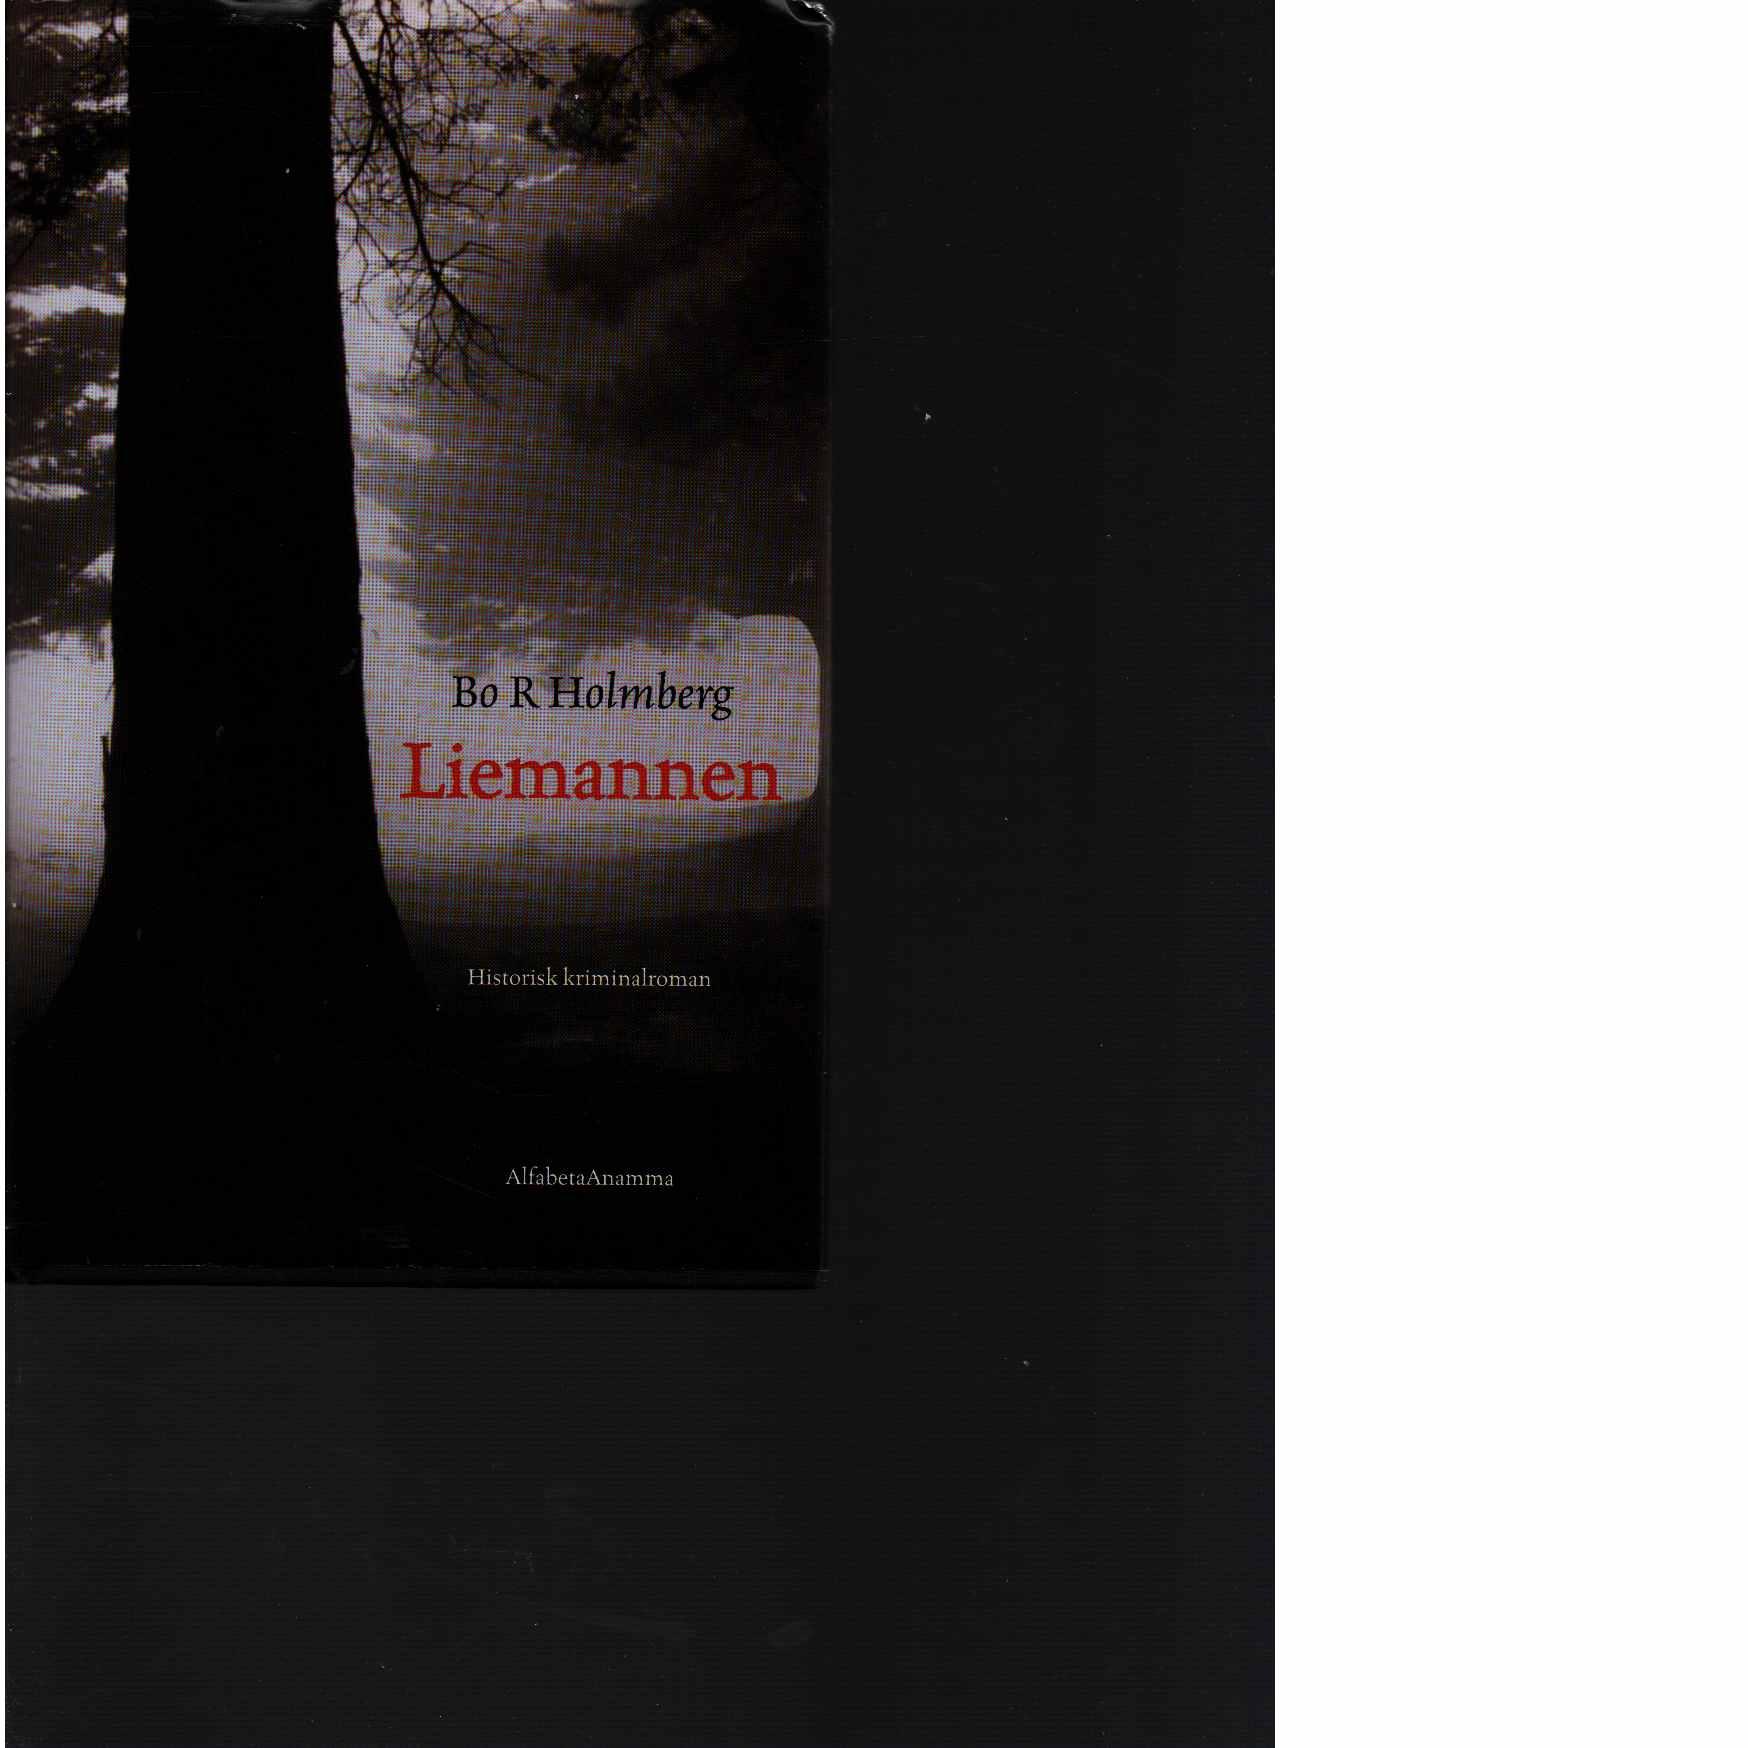 Liemannen  - Holmberg, Bo R.